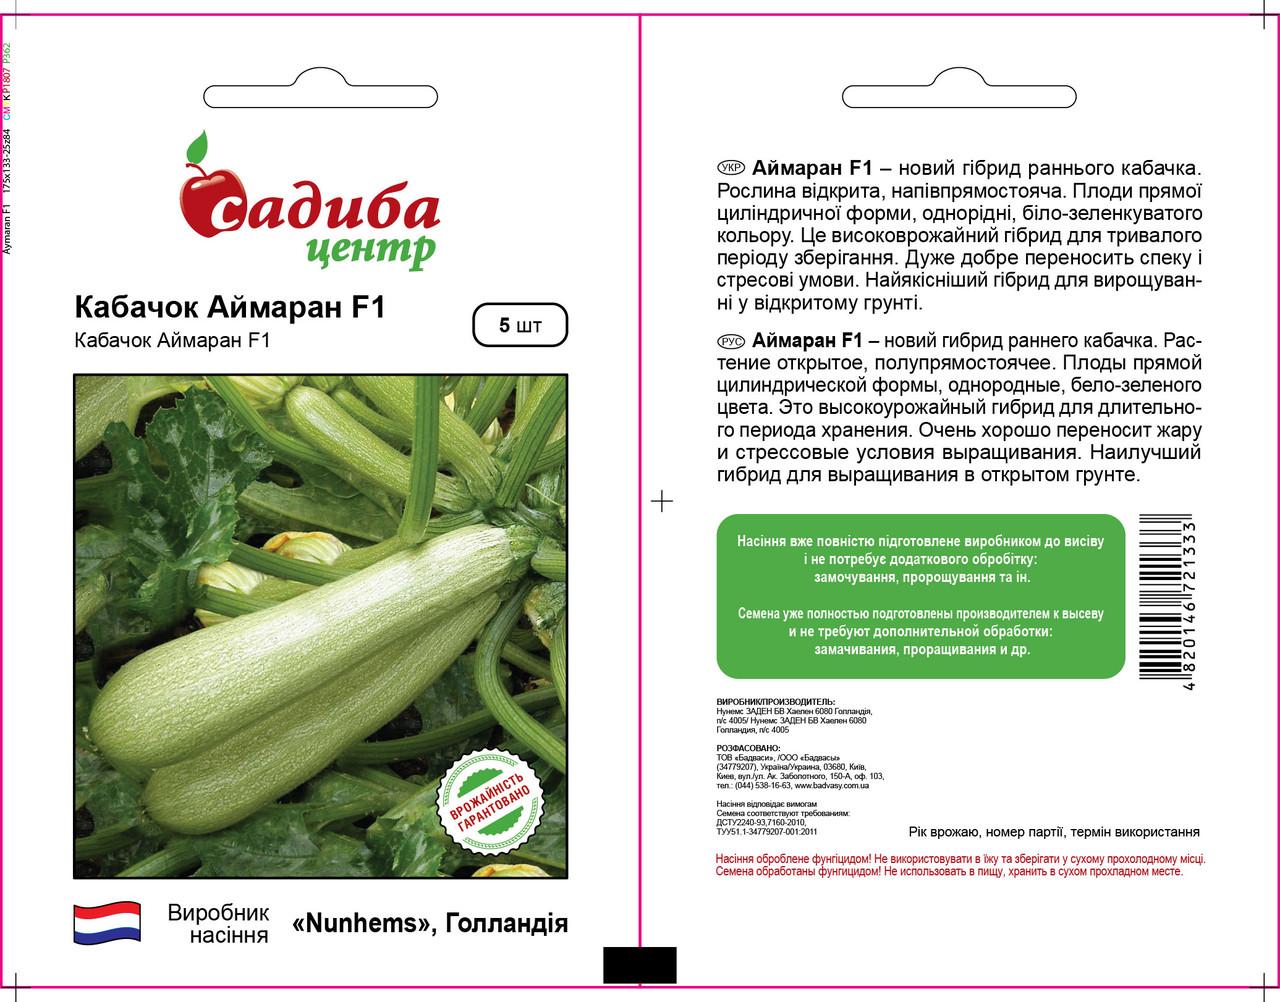 Семена кабачка Аймаран F1 (Nunhems, САДЫБА ЦЕНТР), 5 семян — партенокарпик, ранний гибрид, светлый